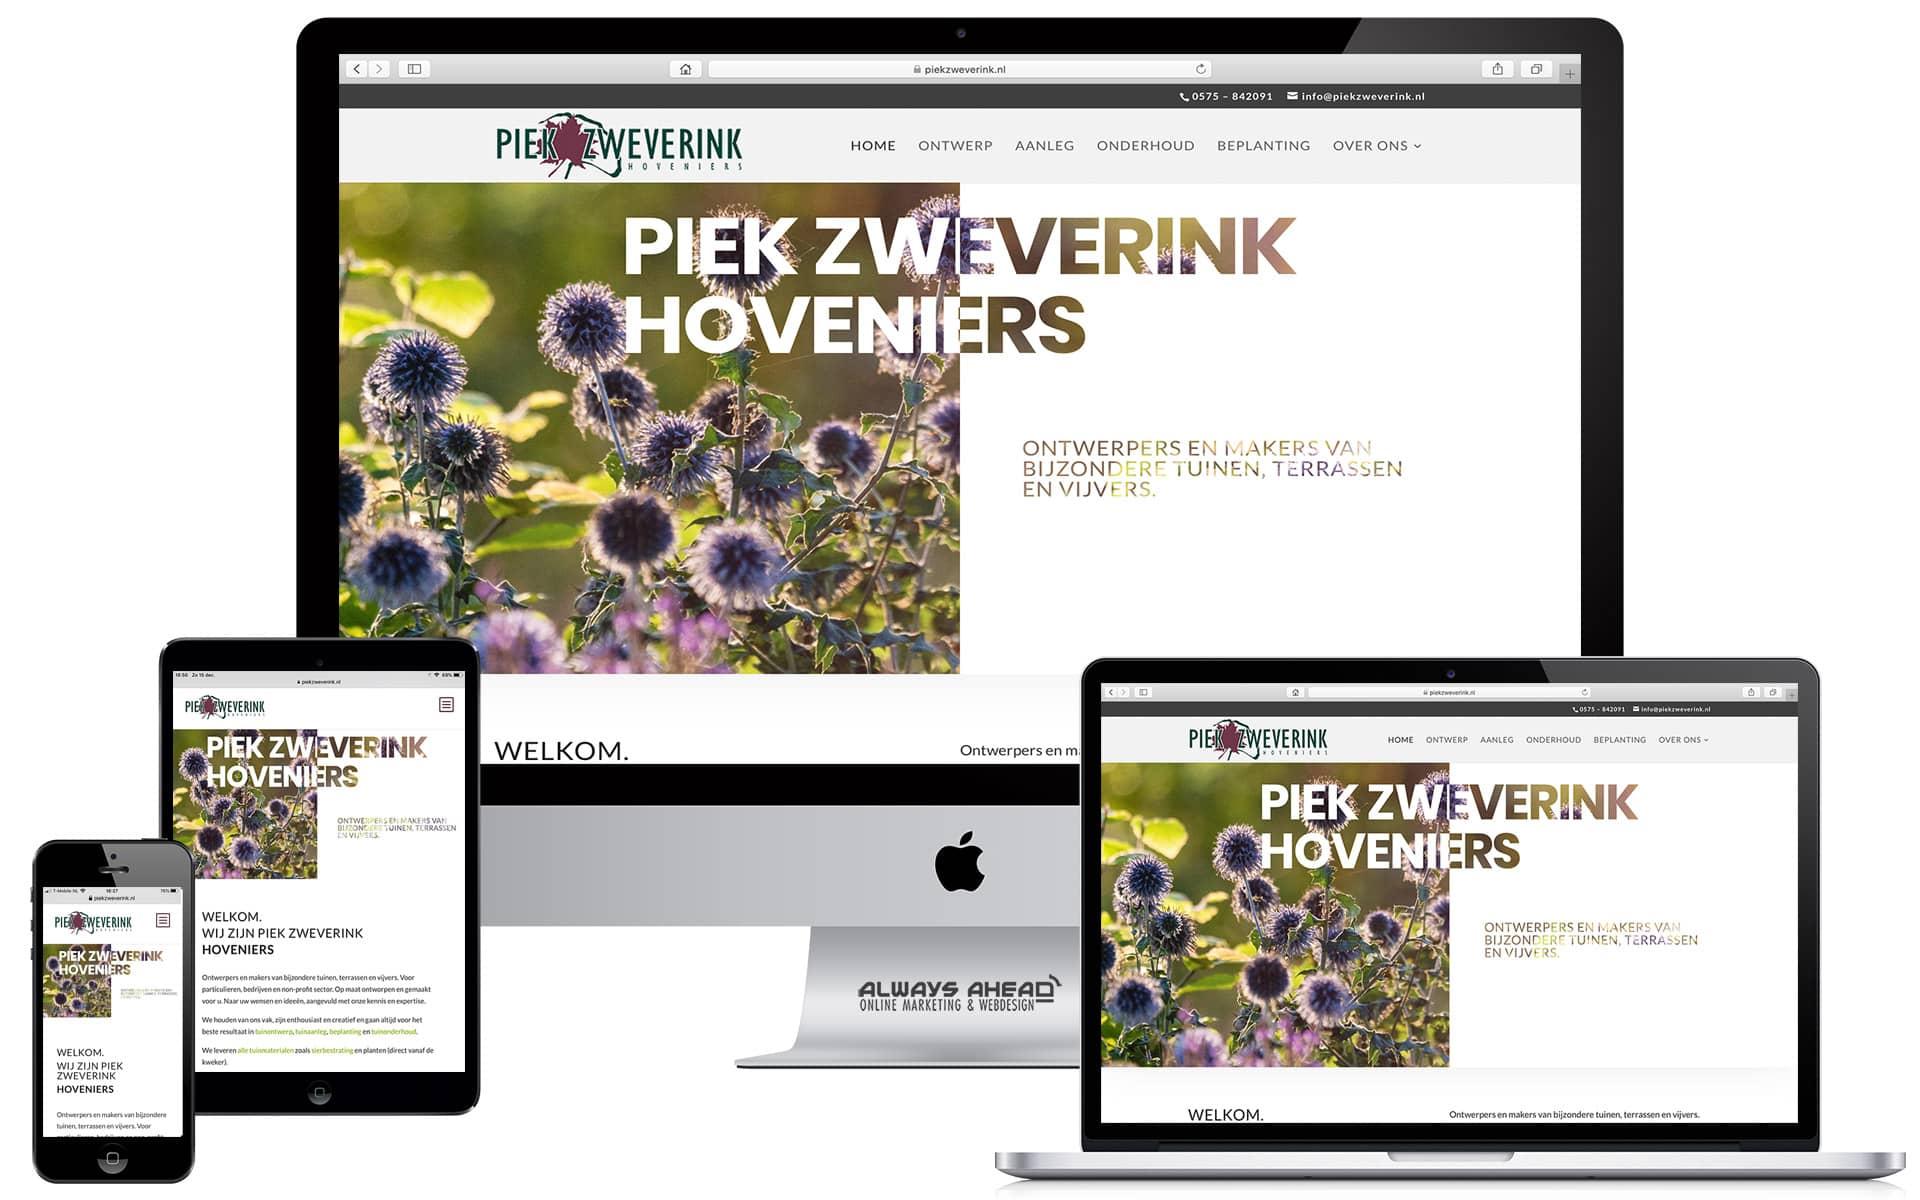 Nieuwe website Piek Zweverink Hoveniers - Always Ahead Online Marketing en Webdesign